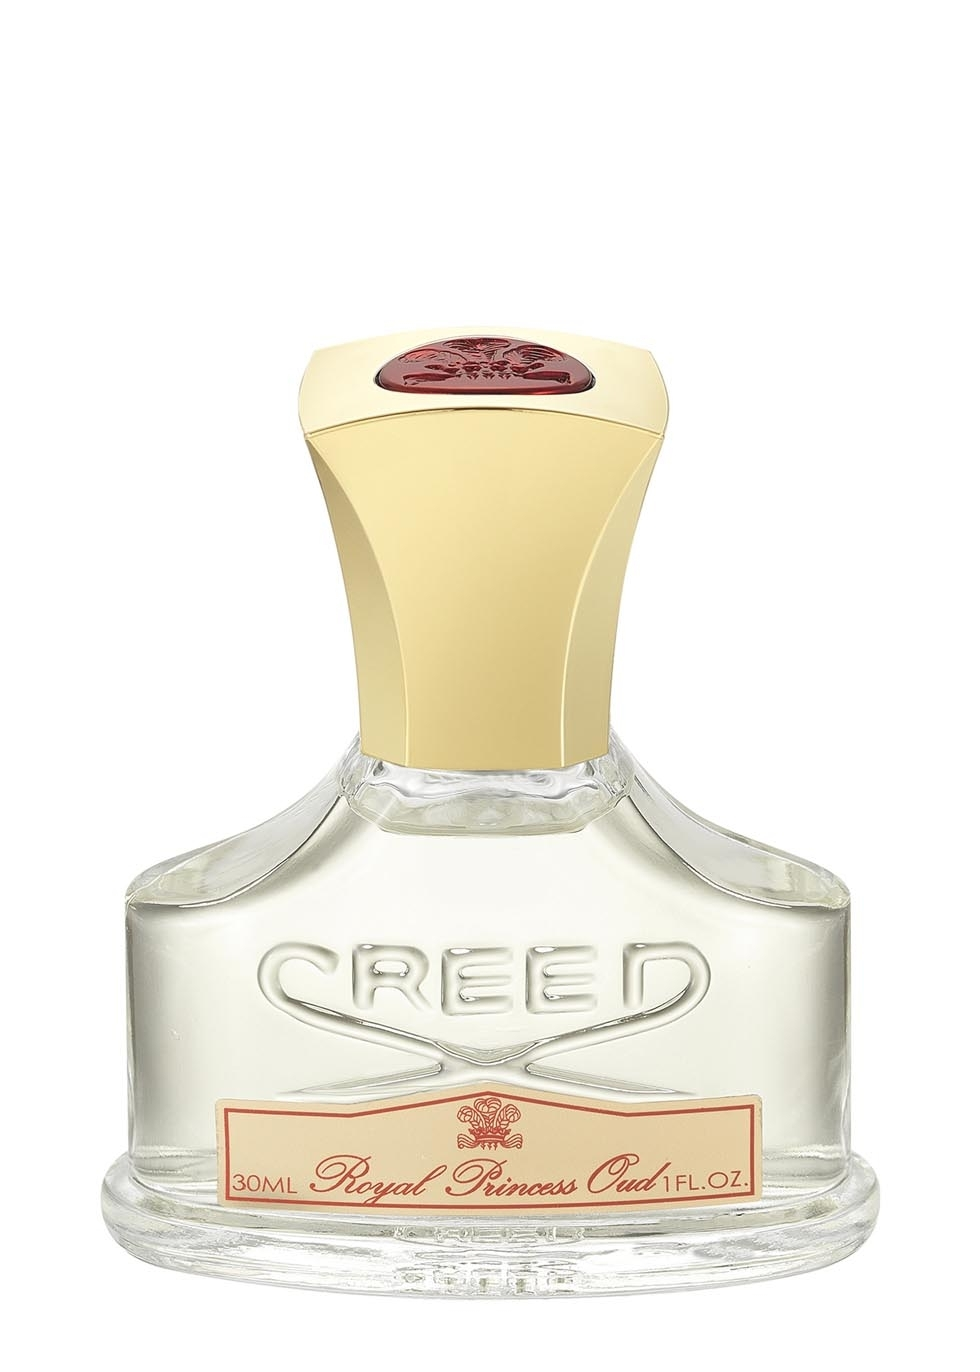 Creed Mens Womens Aftershave Perfume Harvey Nichols